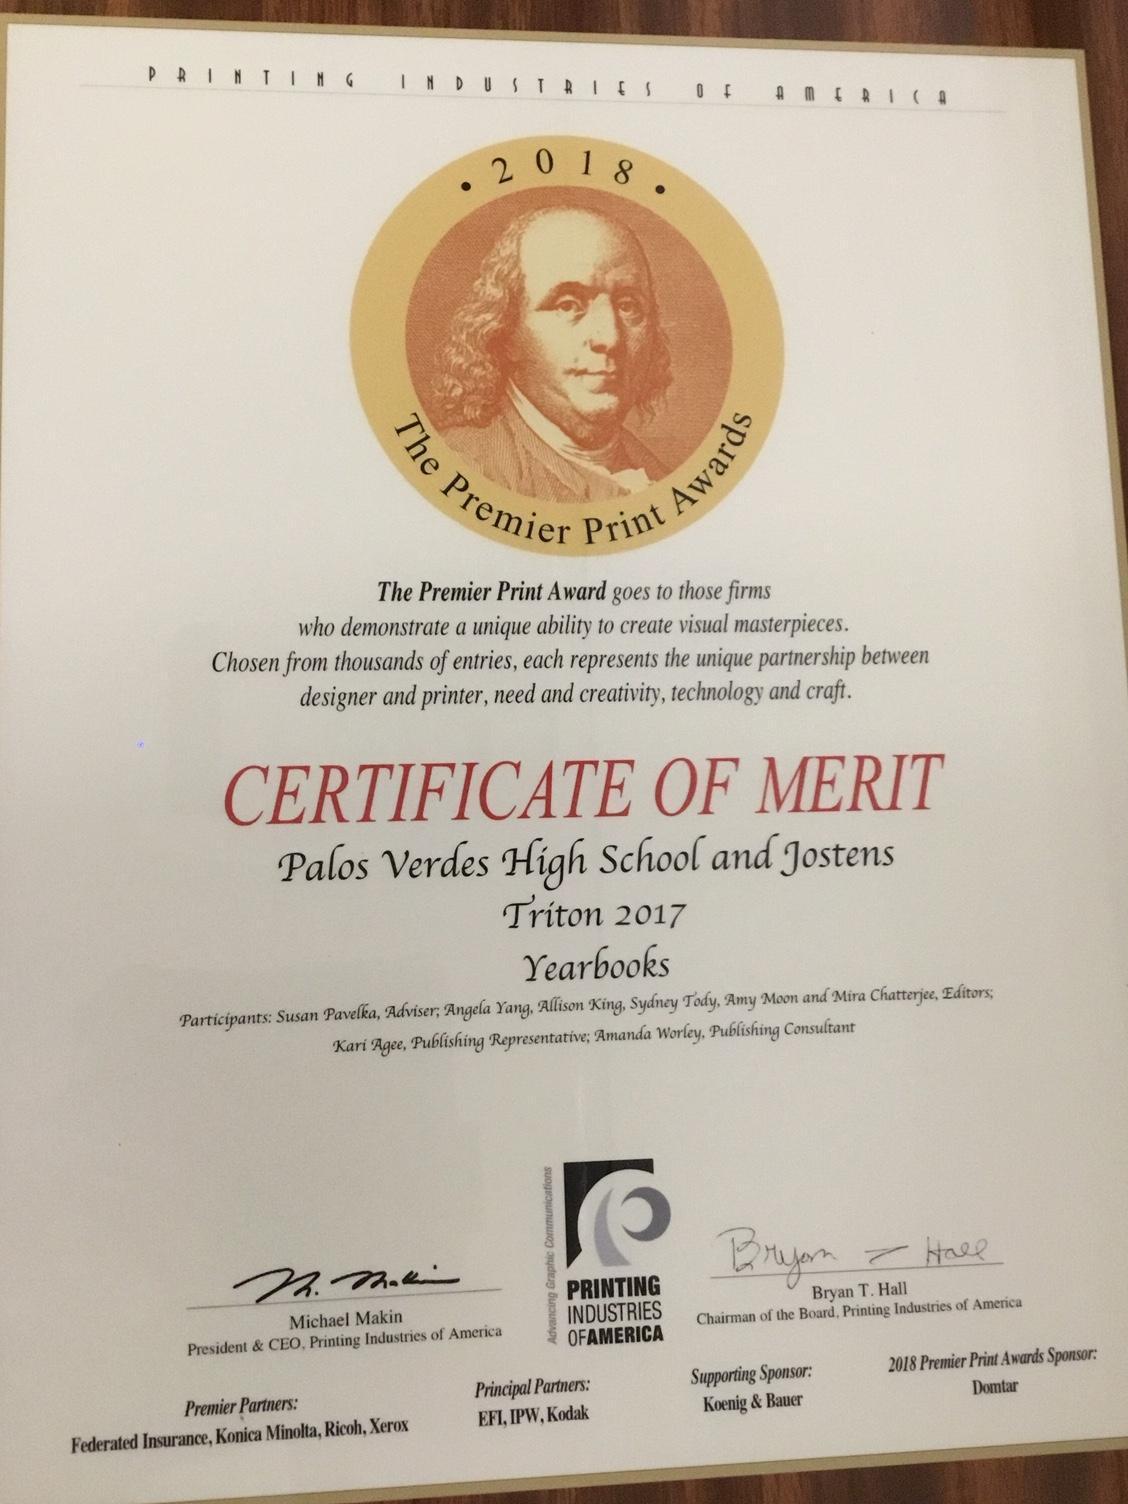 Premier Print Award 2018 Given to Triton Yearbook